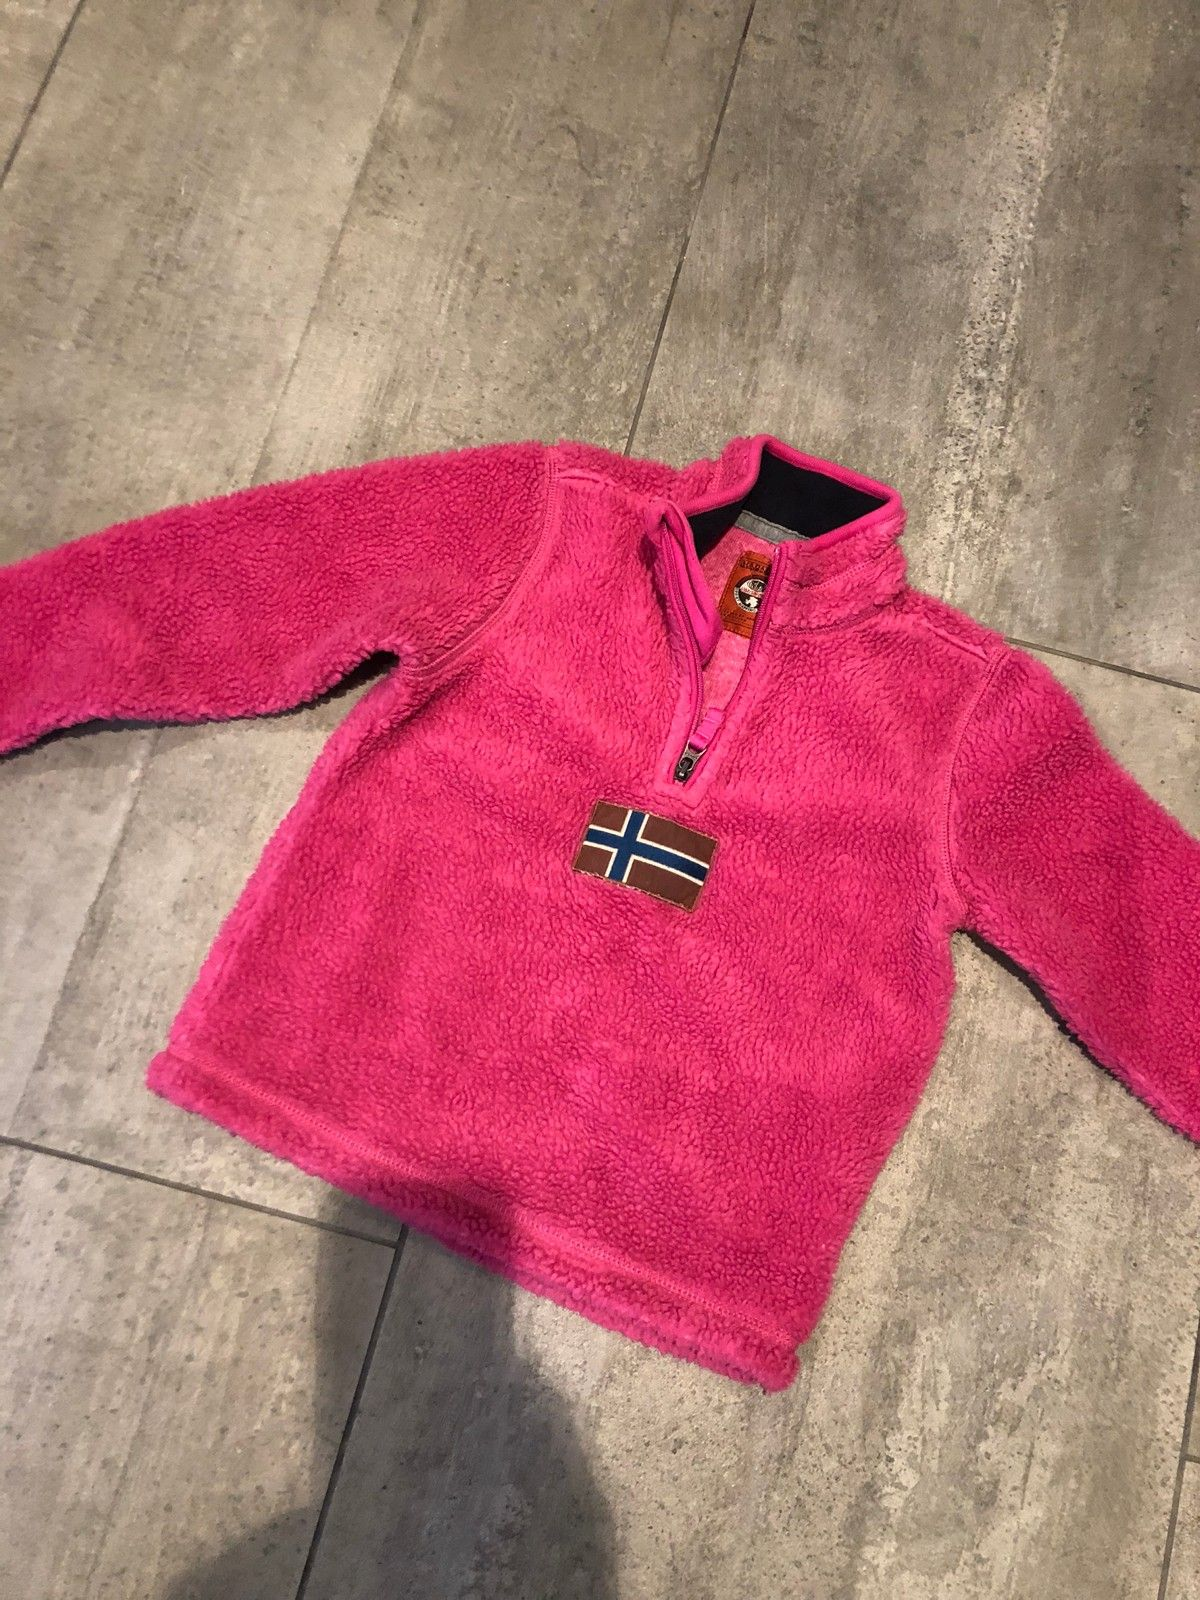 Napapijri fleece genser | FINN.no